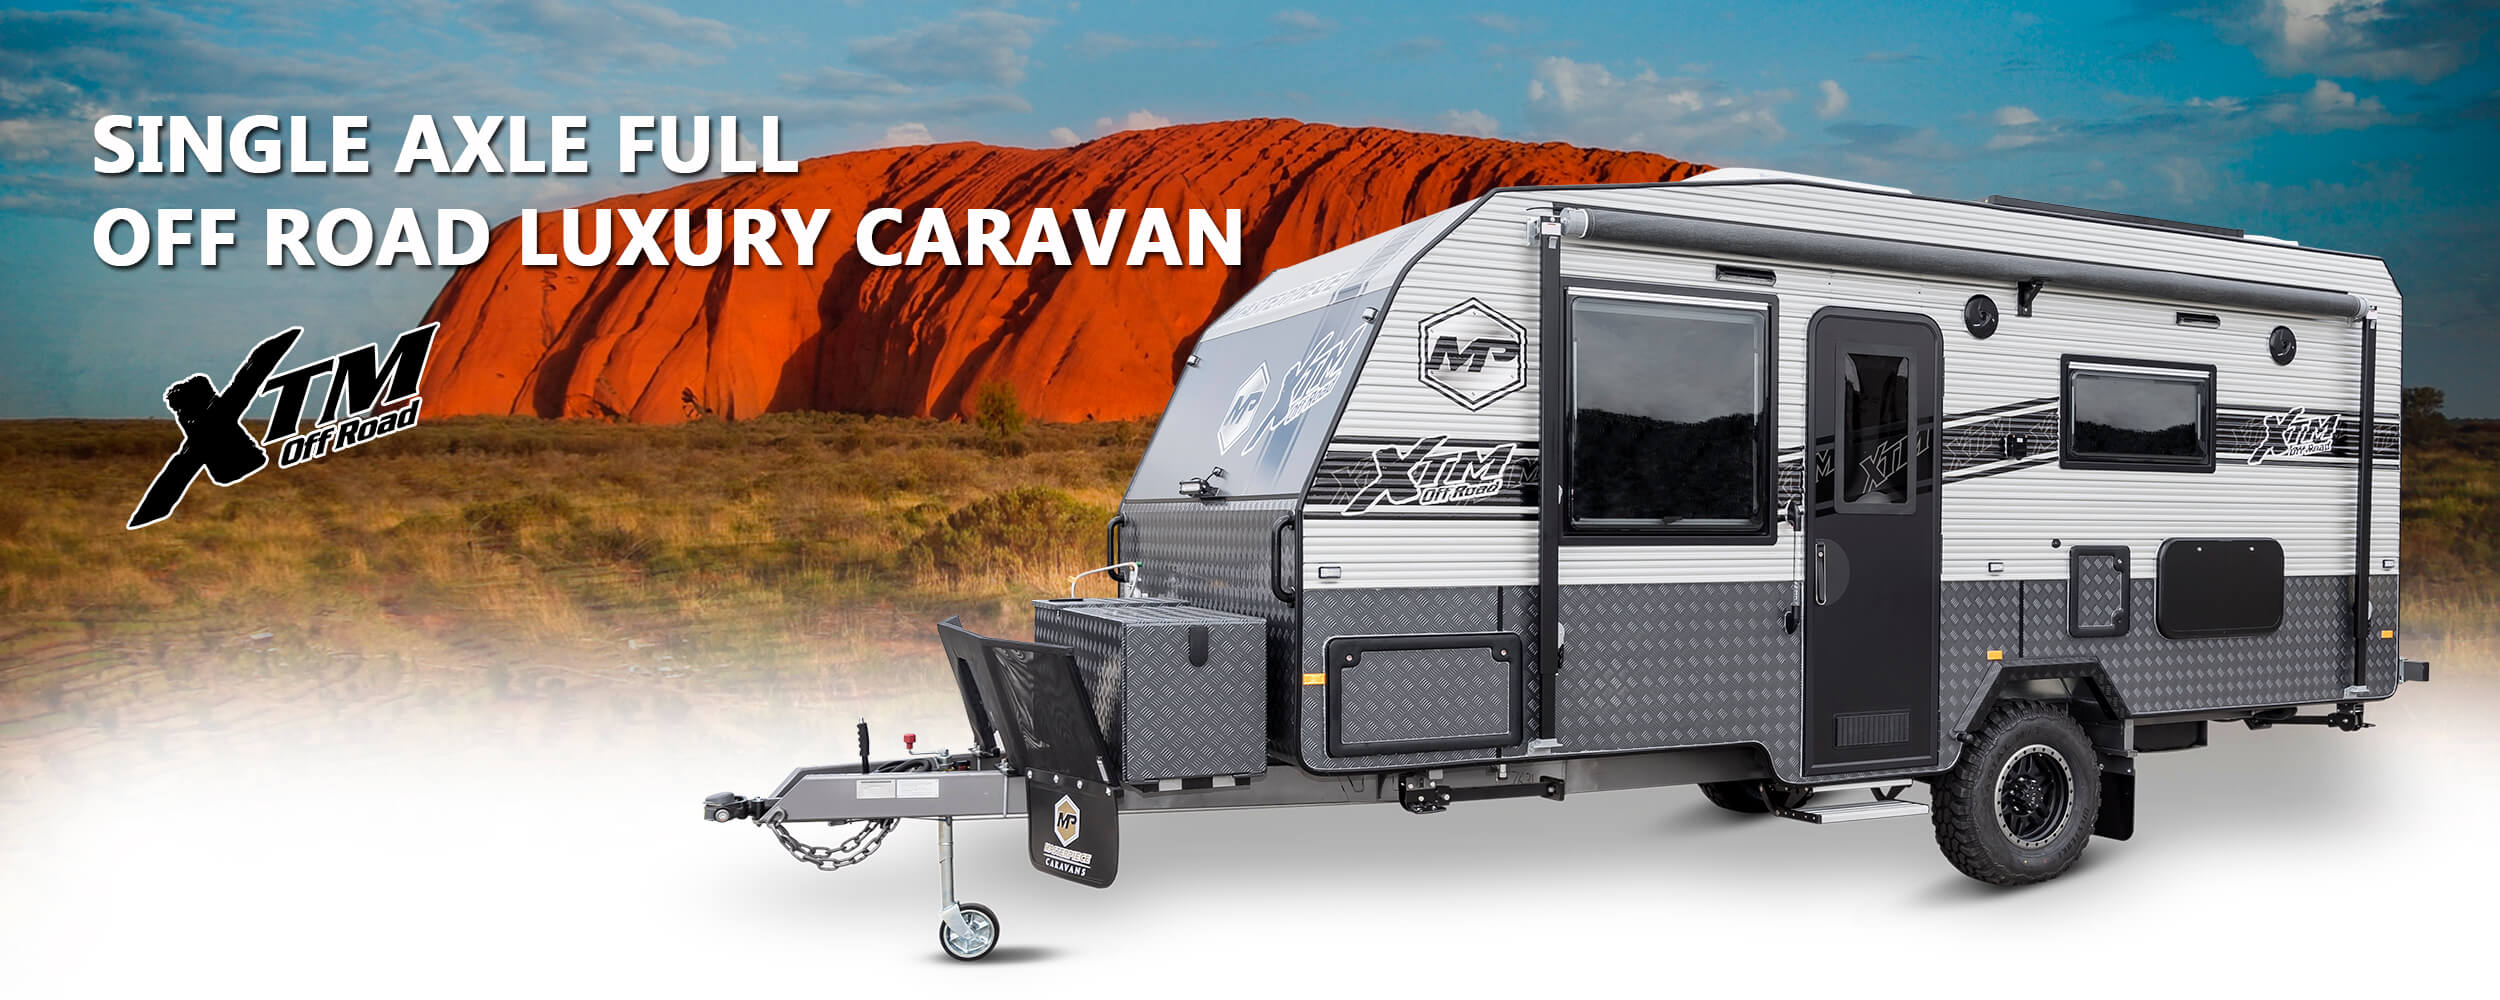 XTM - Single Axle Full Off Road Luxury Caravan